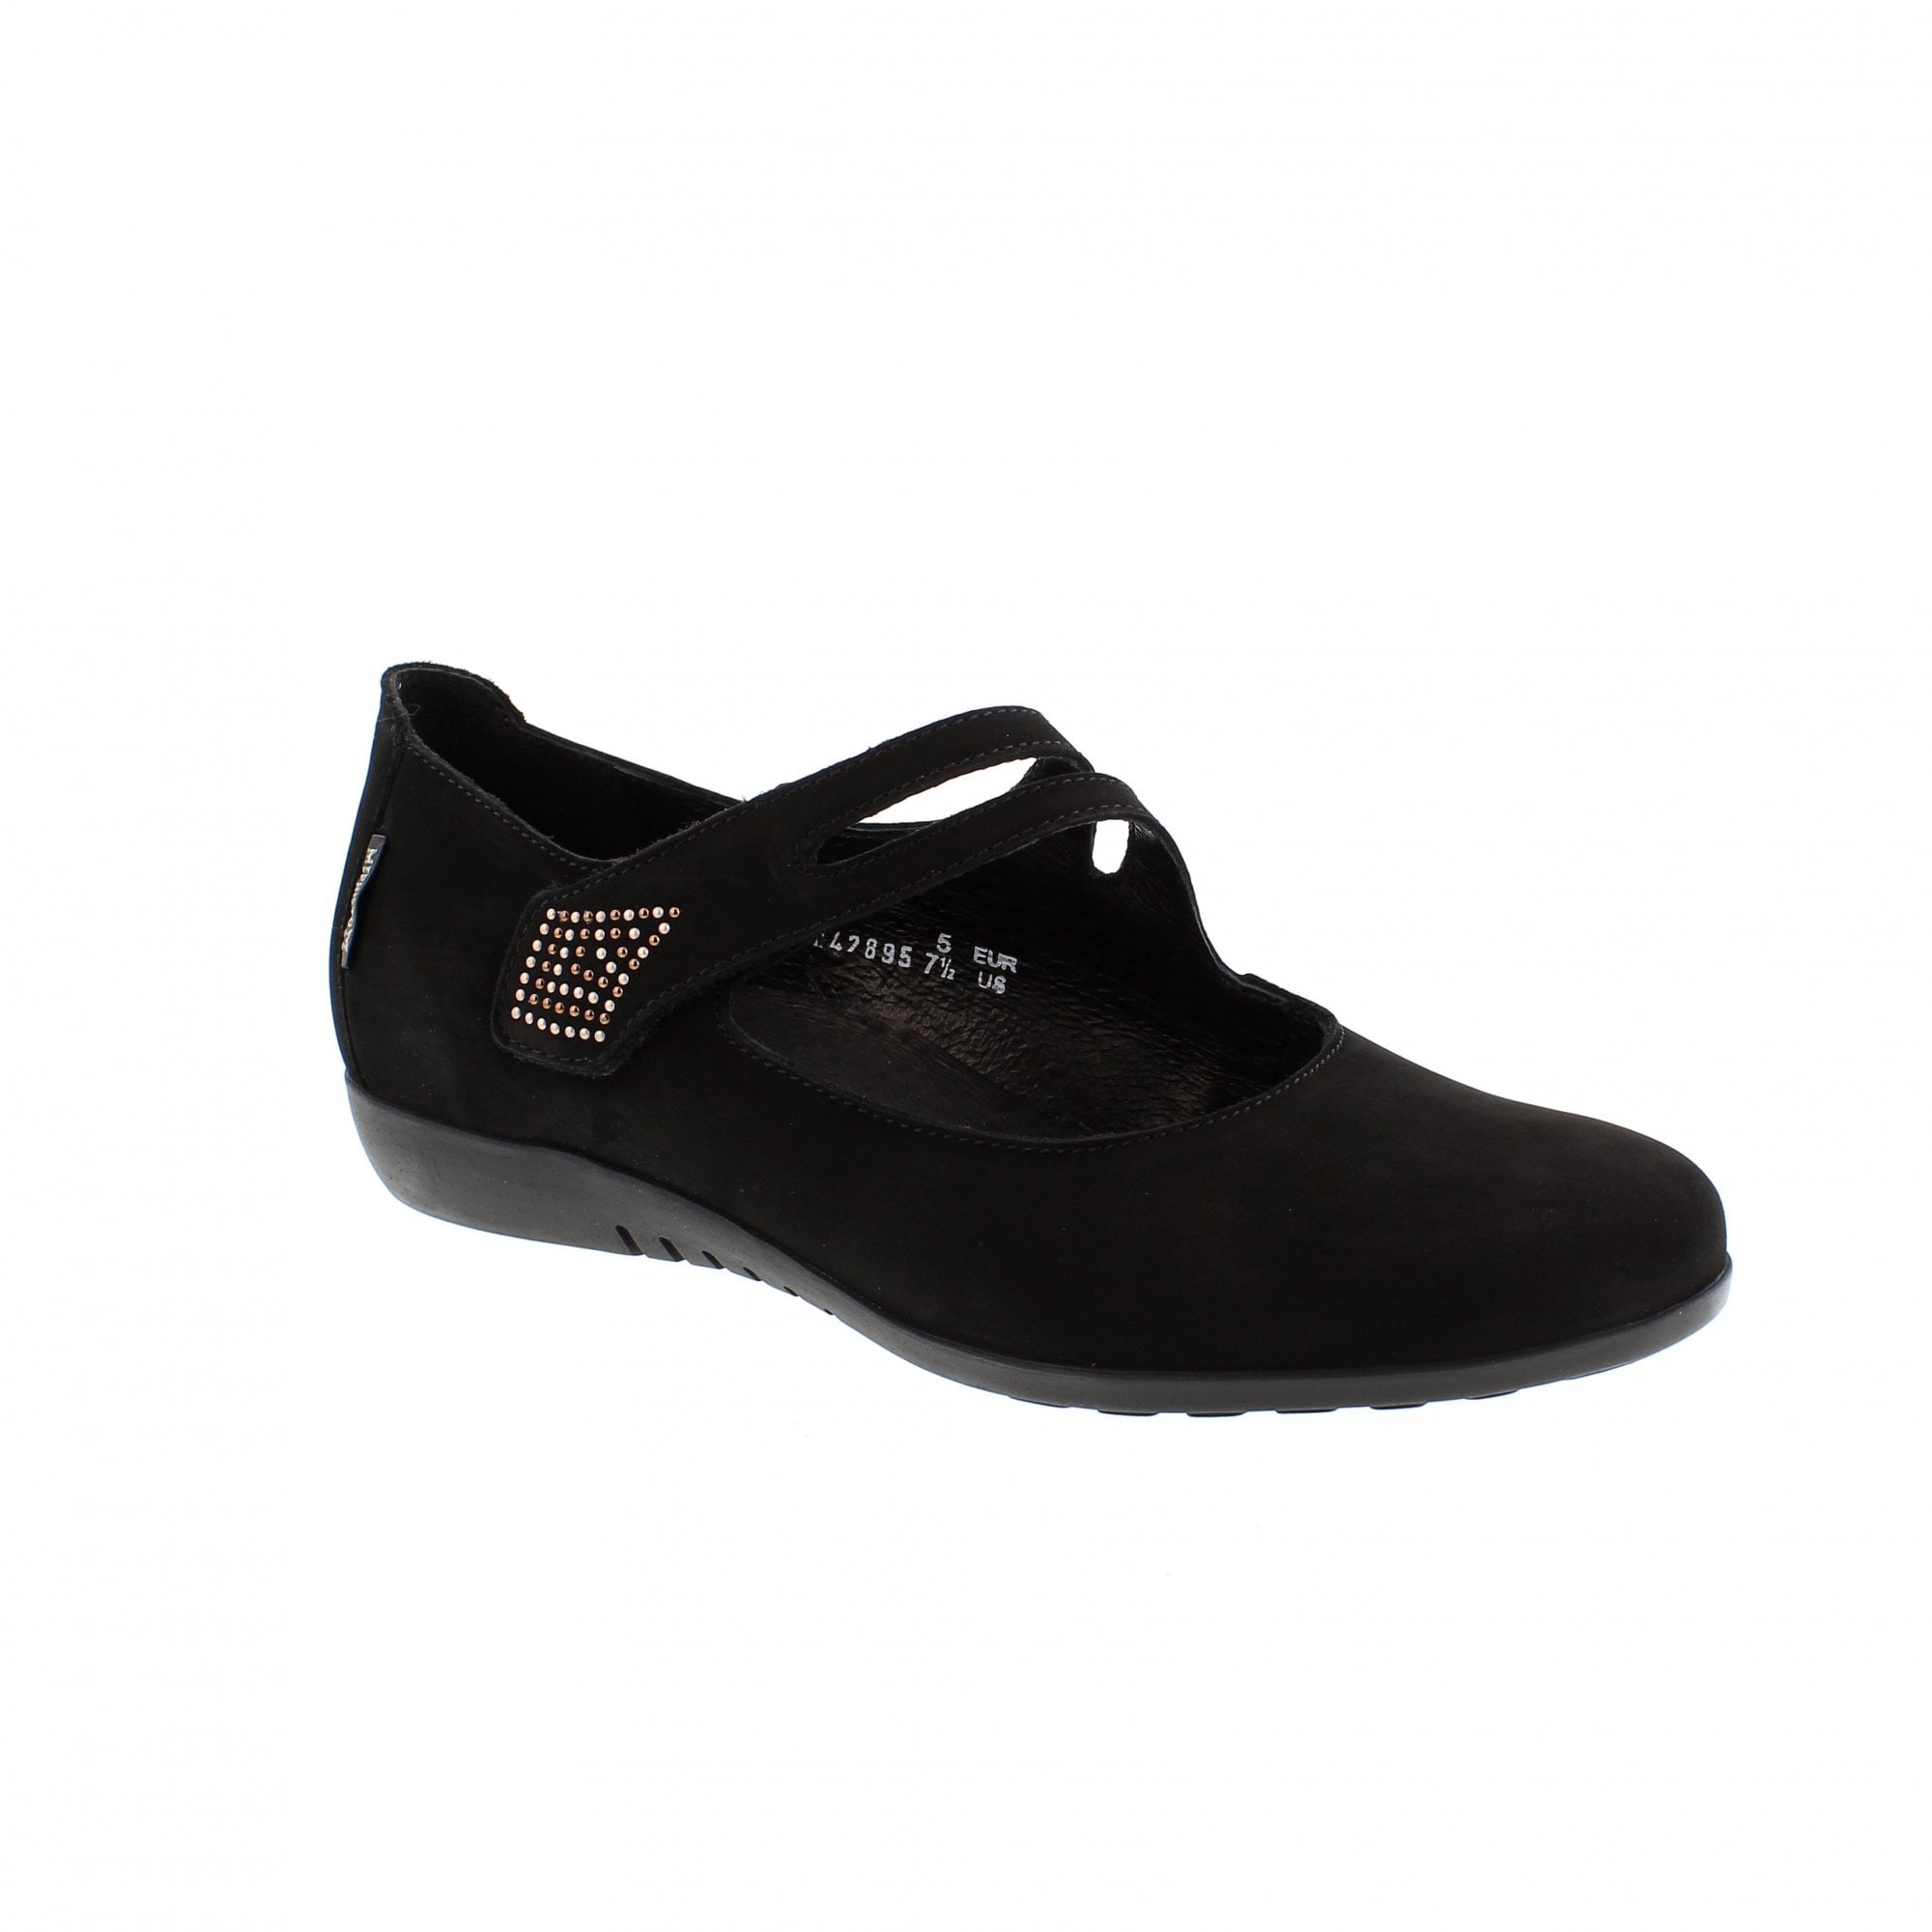 e6ed65efd3 Mephisto Dora 6900 Womens Mary Jane Bar Shoes